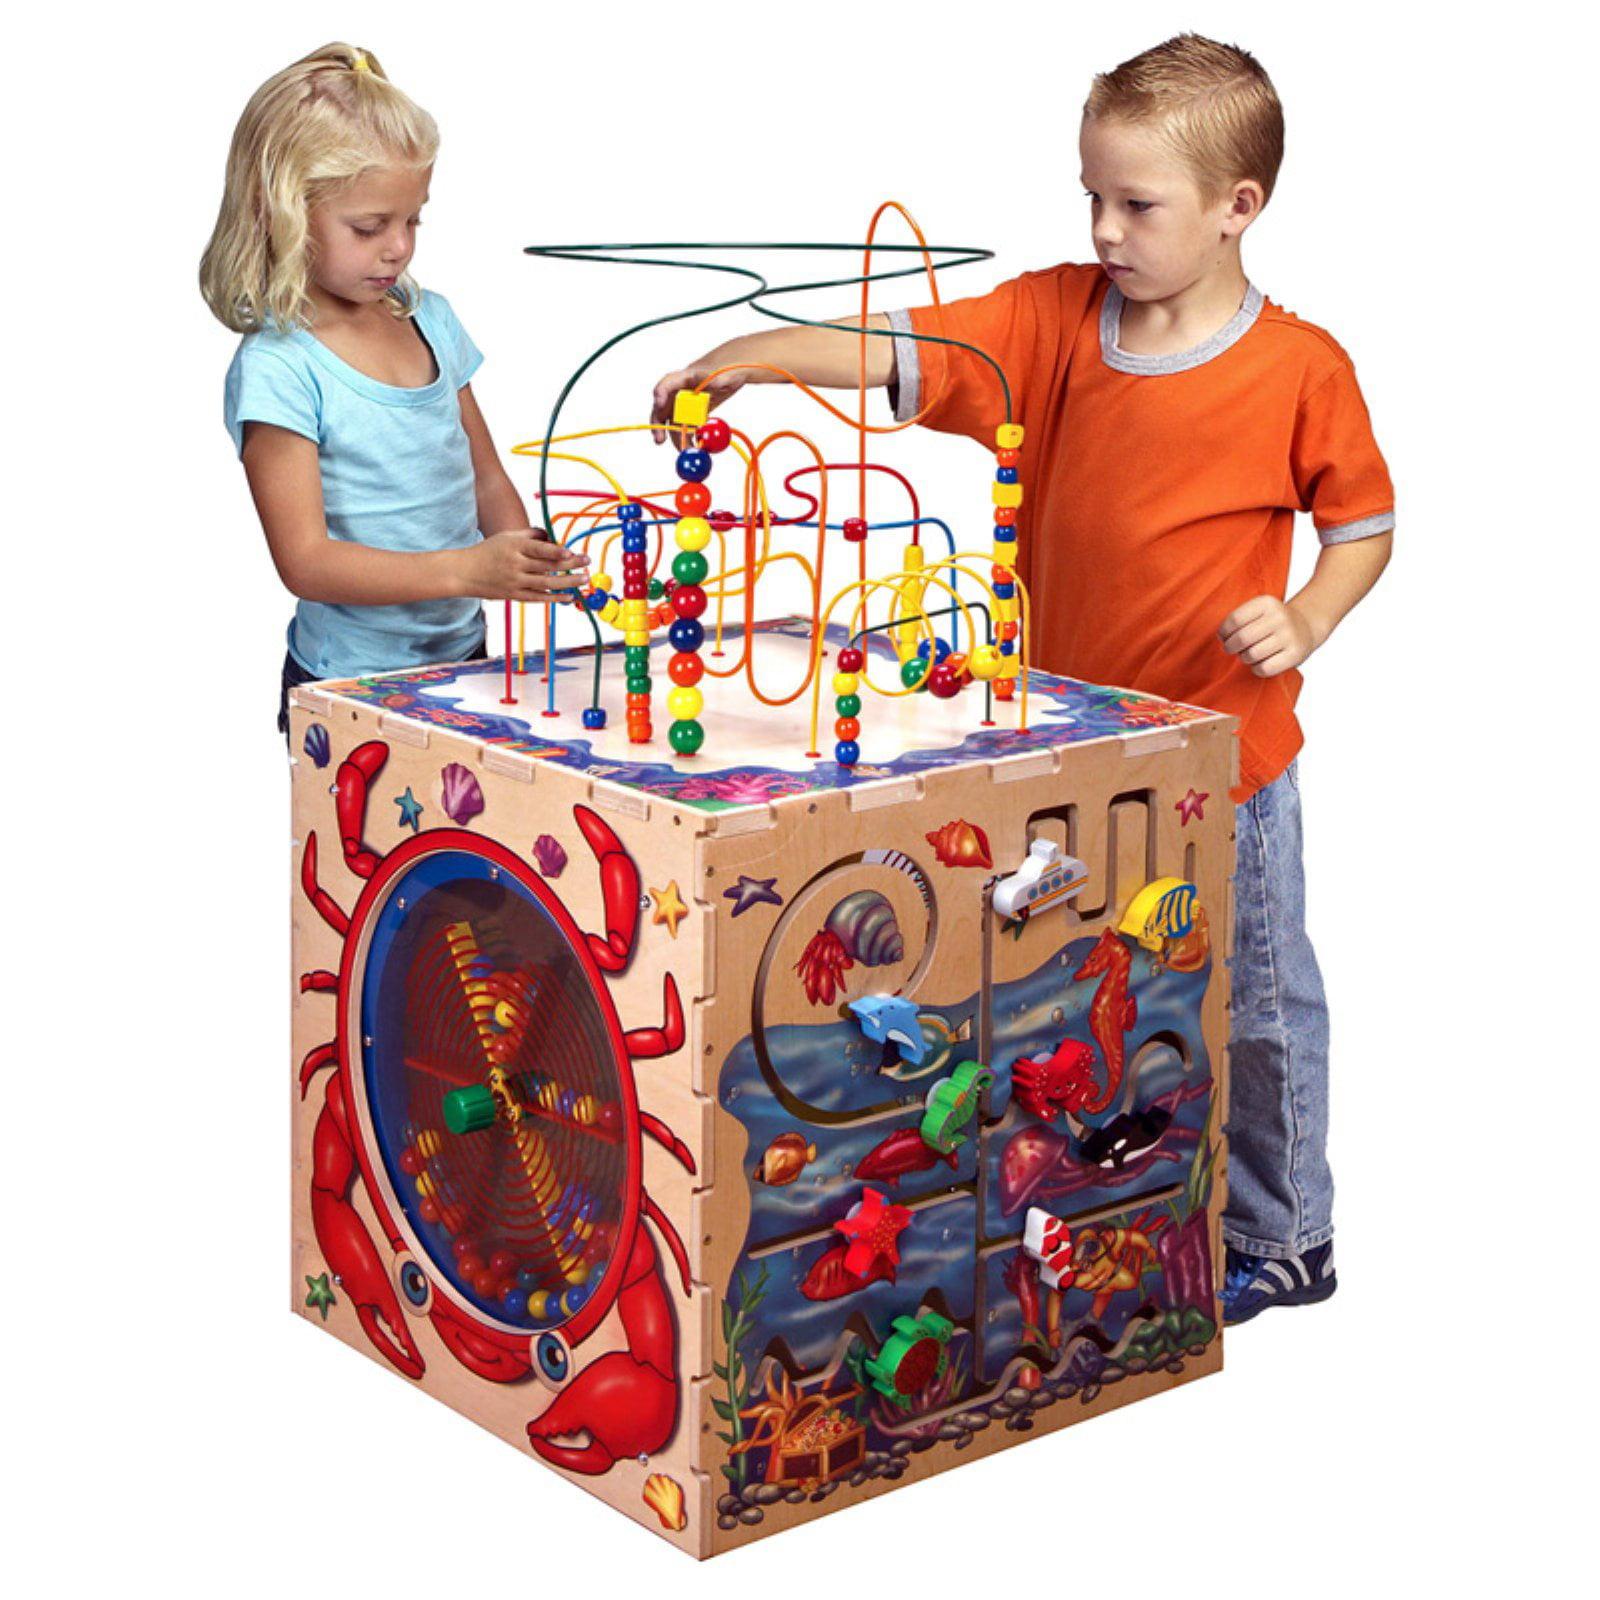 Anatex Sea Life Play Cube Activity Center by Anatex